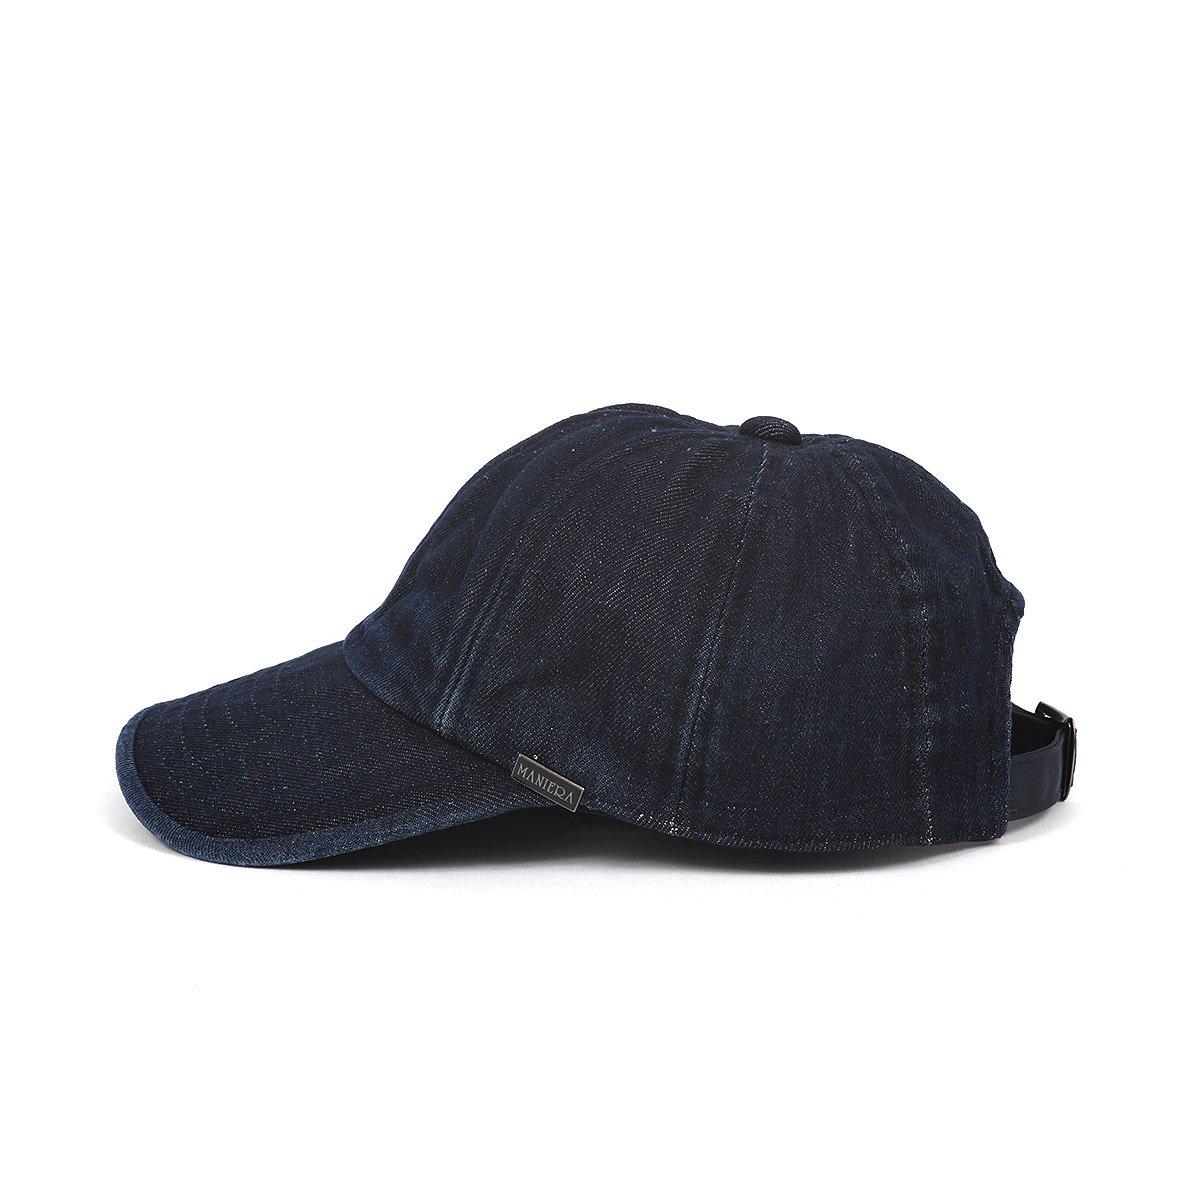 INDIGO 8PANEL CAP 詳細画像1